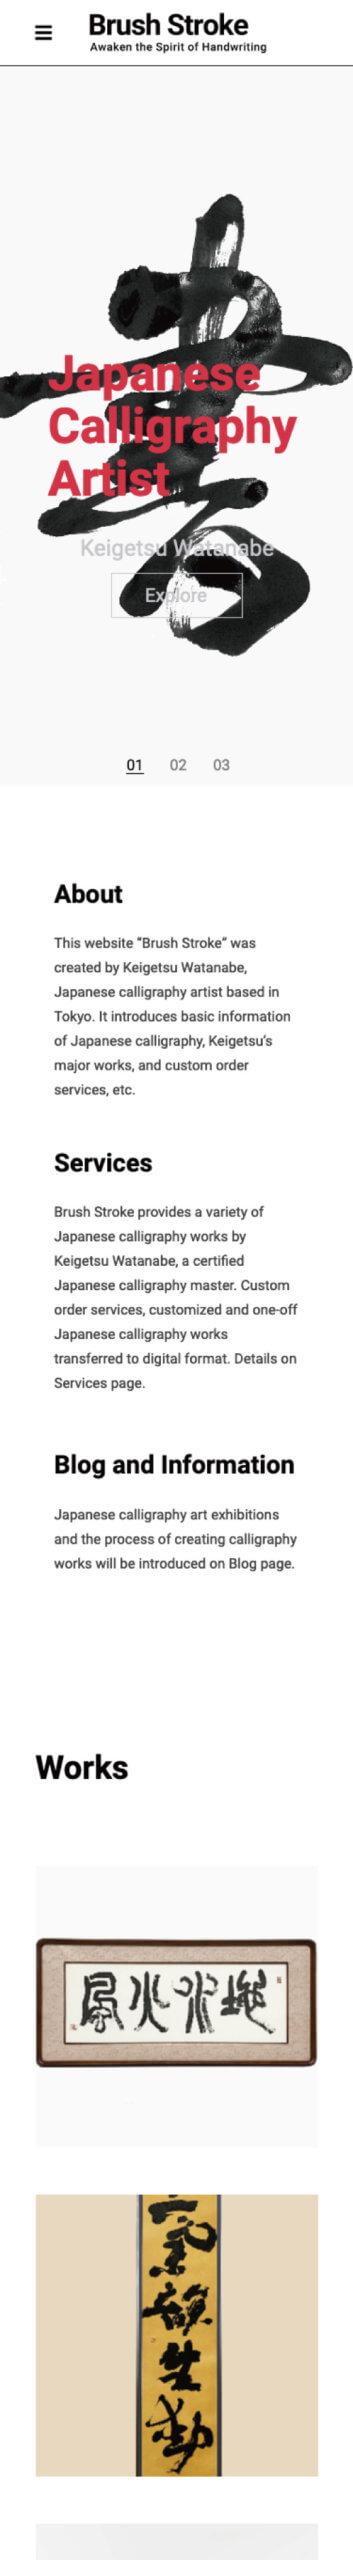 Brush Strokeホームページ、スマホ版